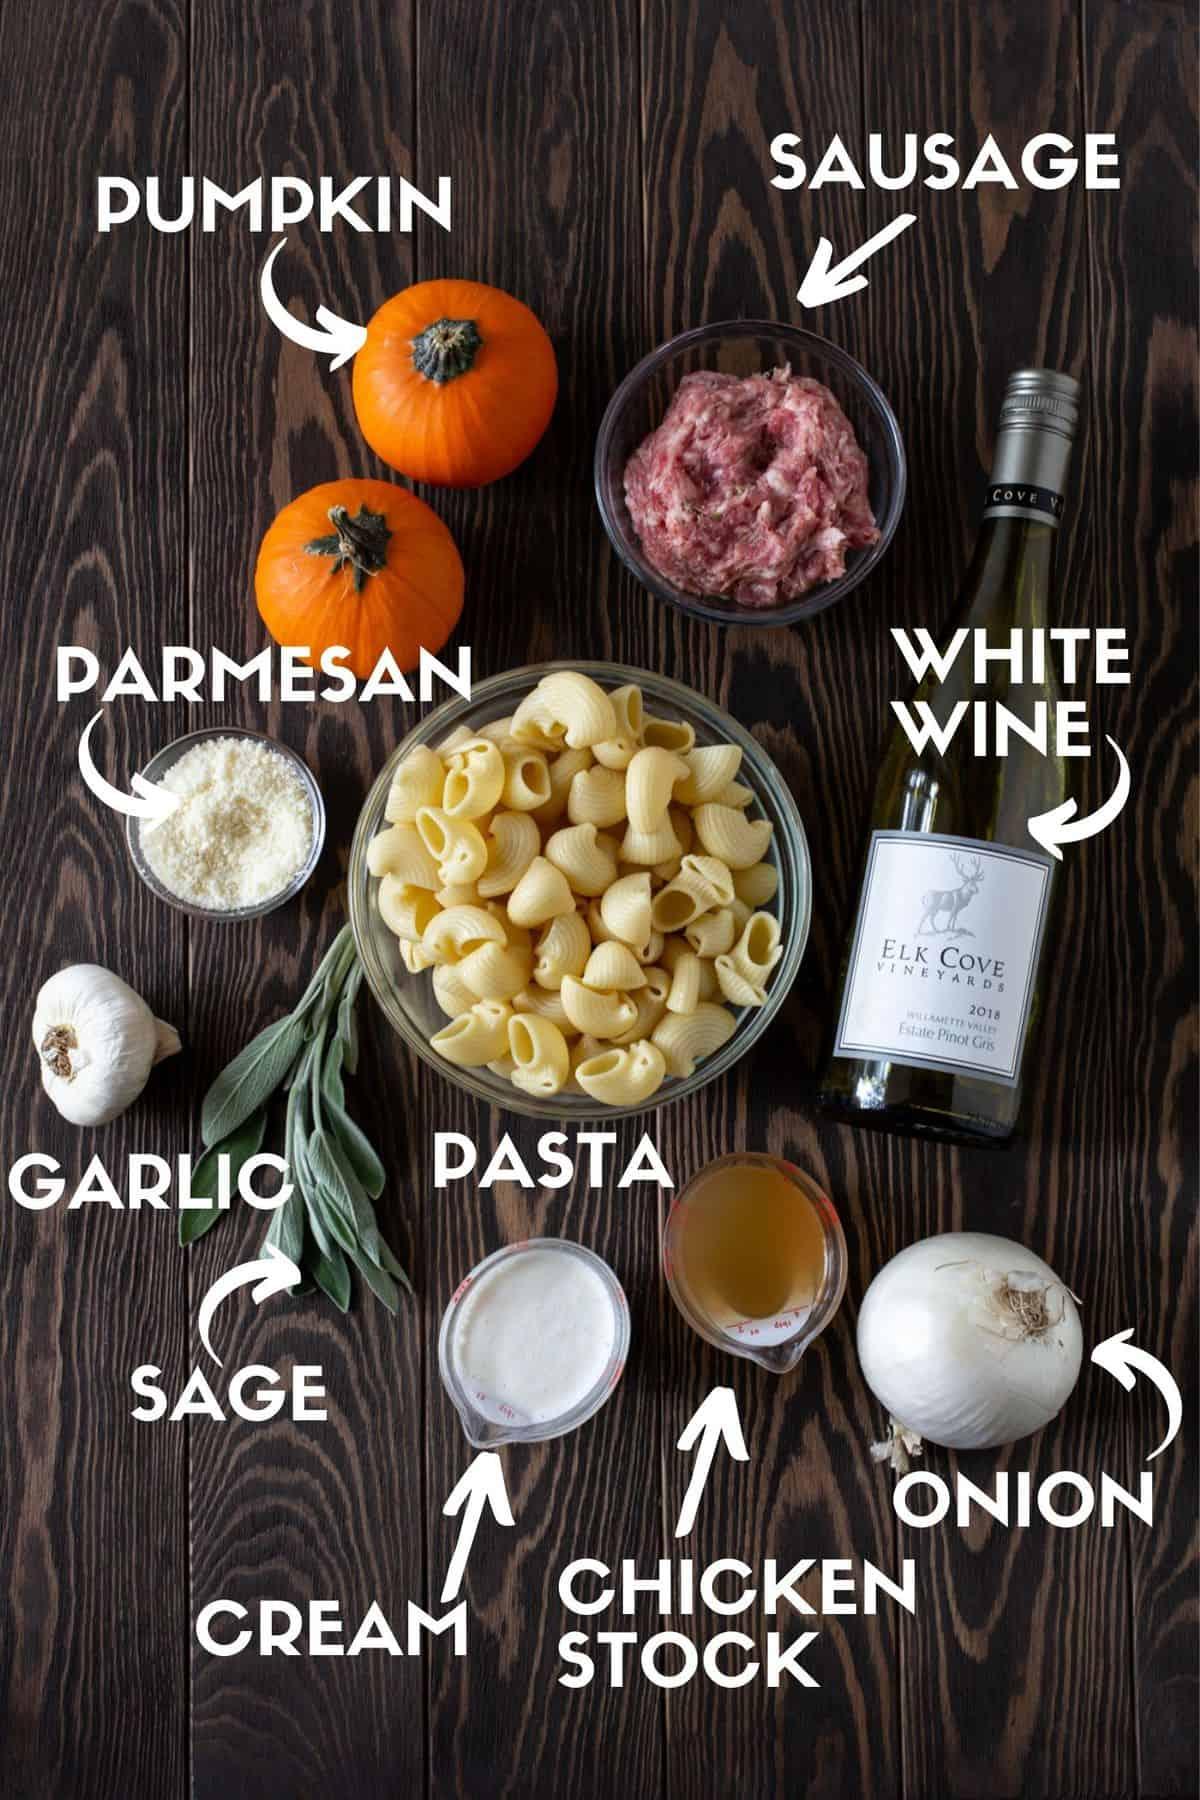 pumpkin pasta ingredients including sausage, sage leaves, onion, garlic, pumpkin and cream.